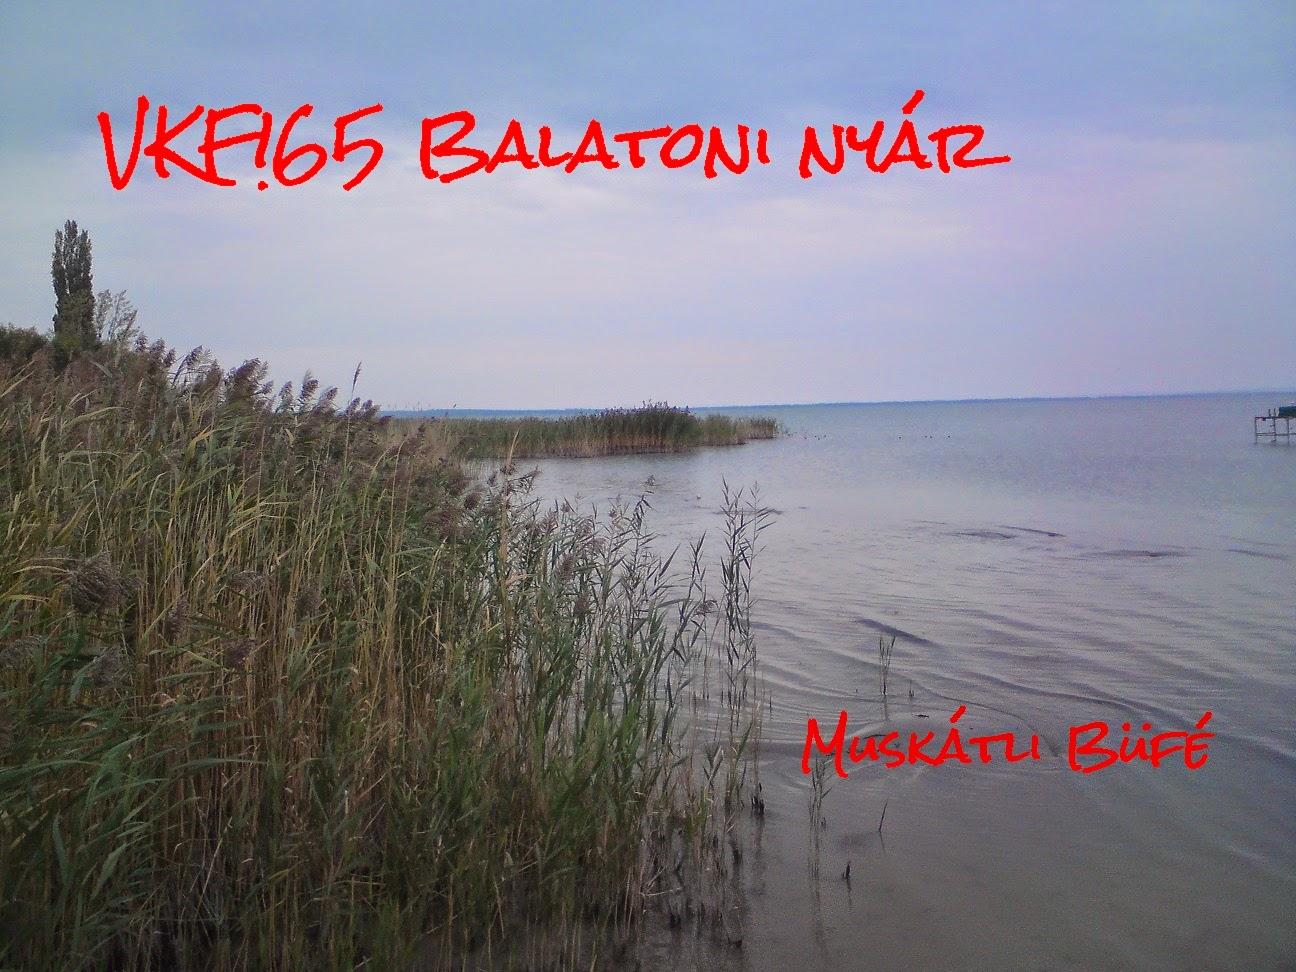 http://muskatlibufe.blogspot.hu/2014/08/osszefoglalo-vkf65-balatoni-nyar.html